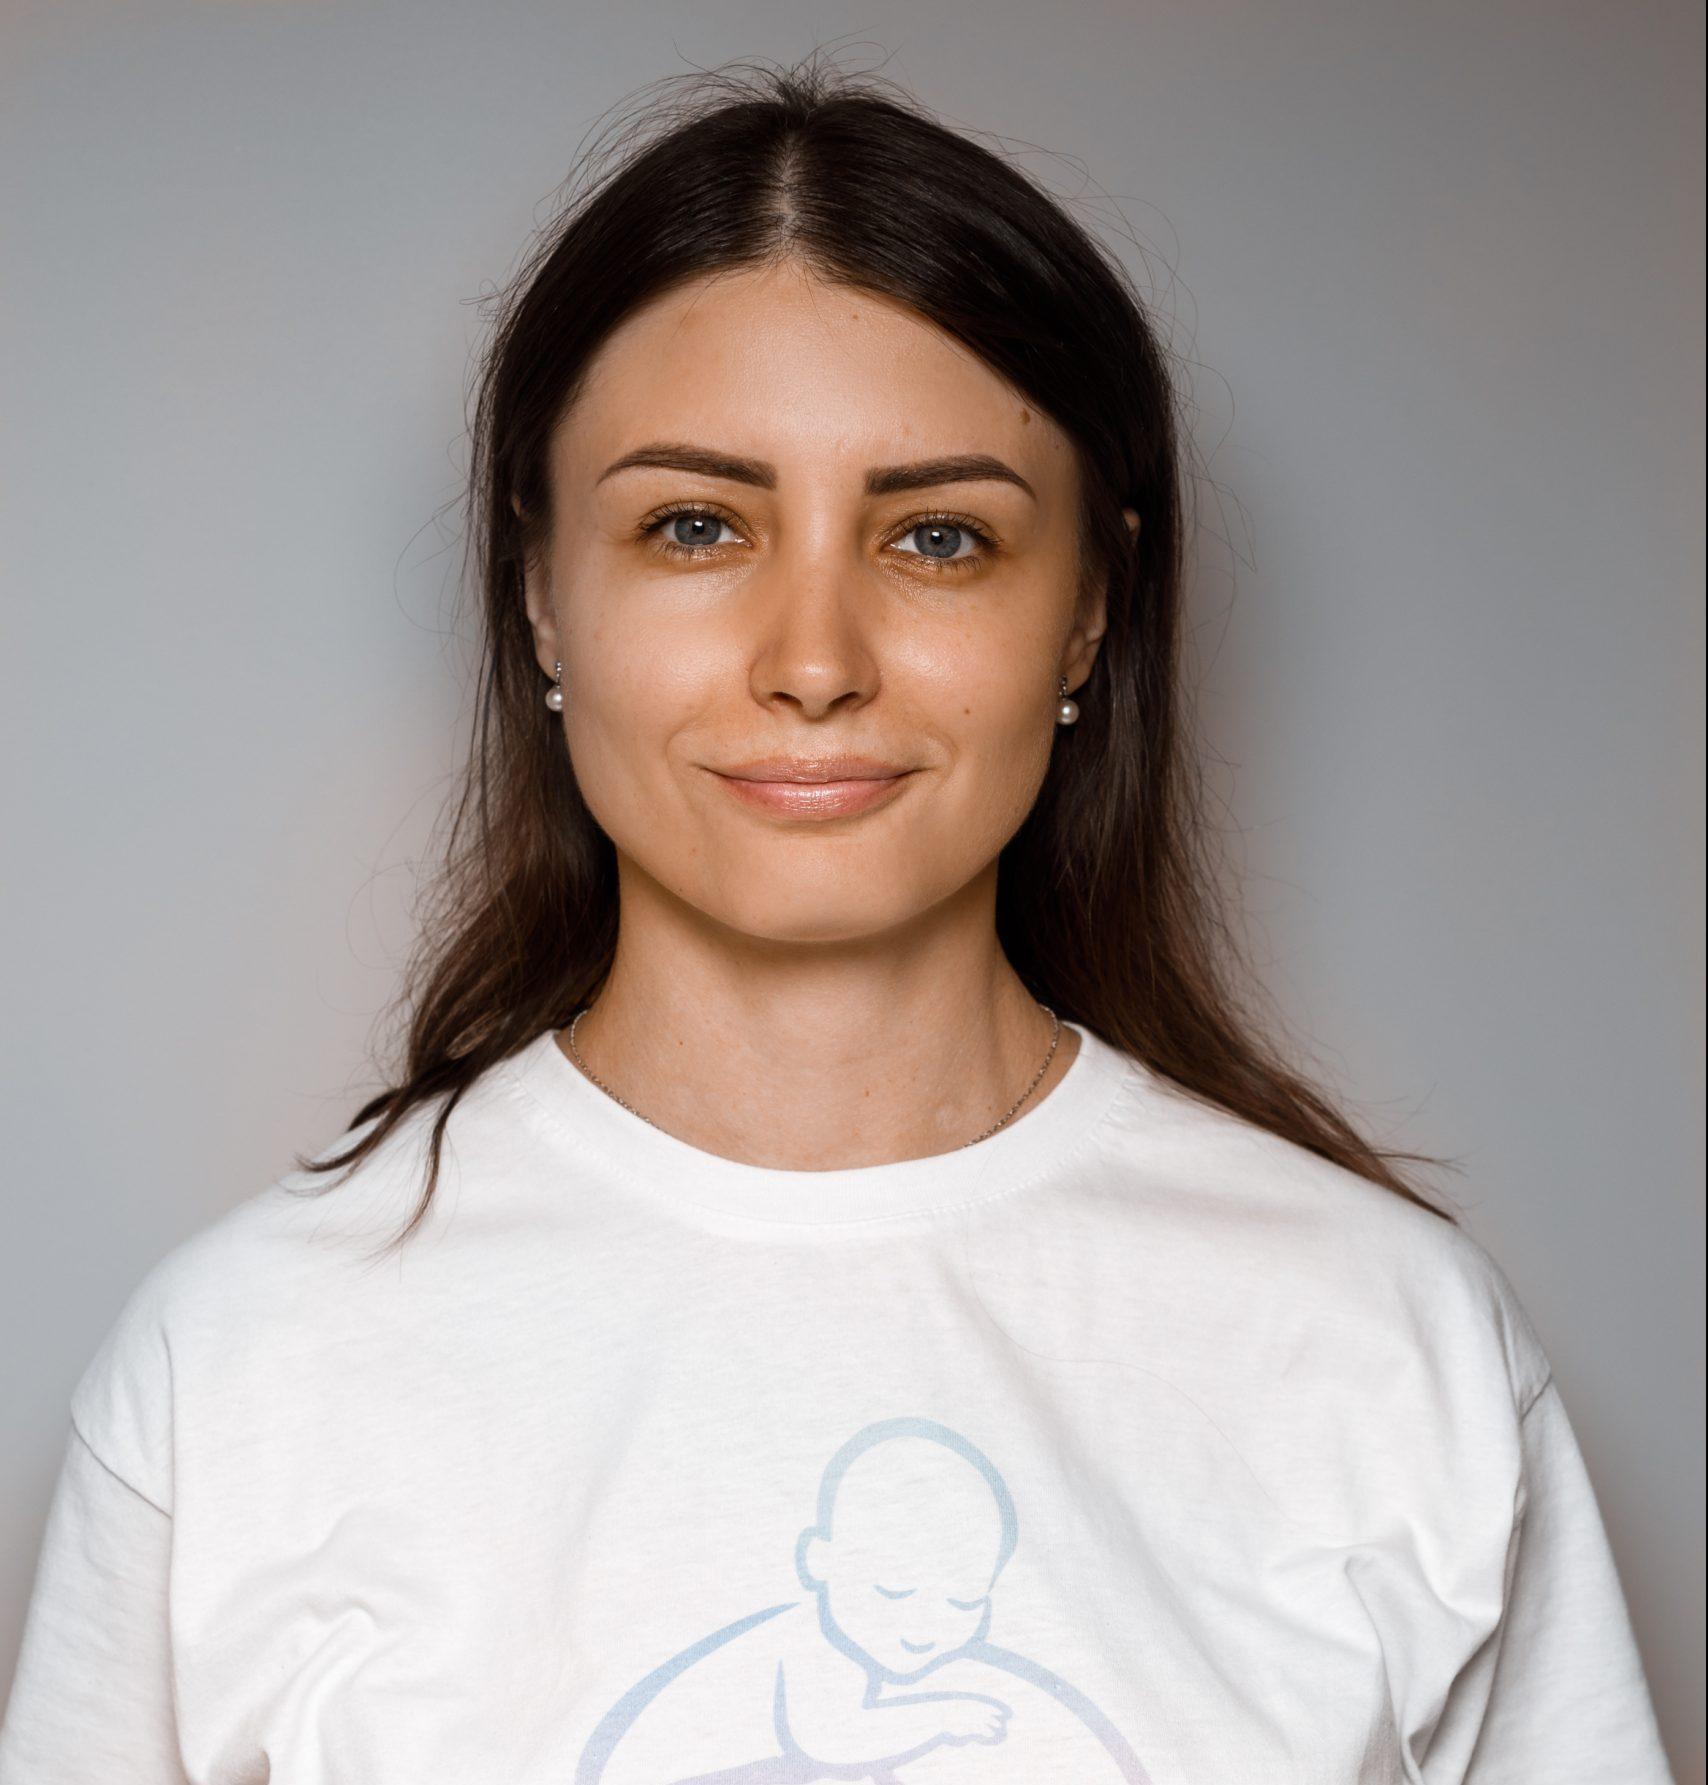 Katerina Petrovskaya